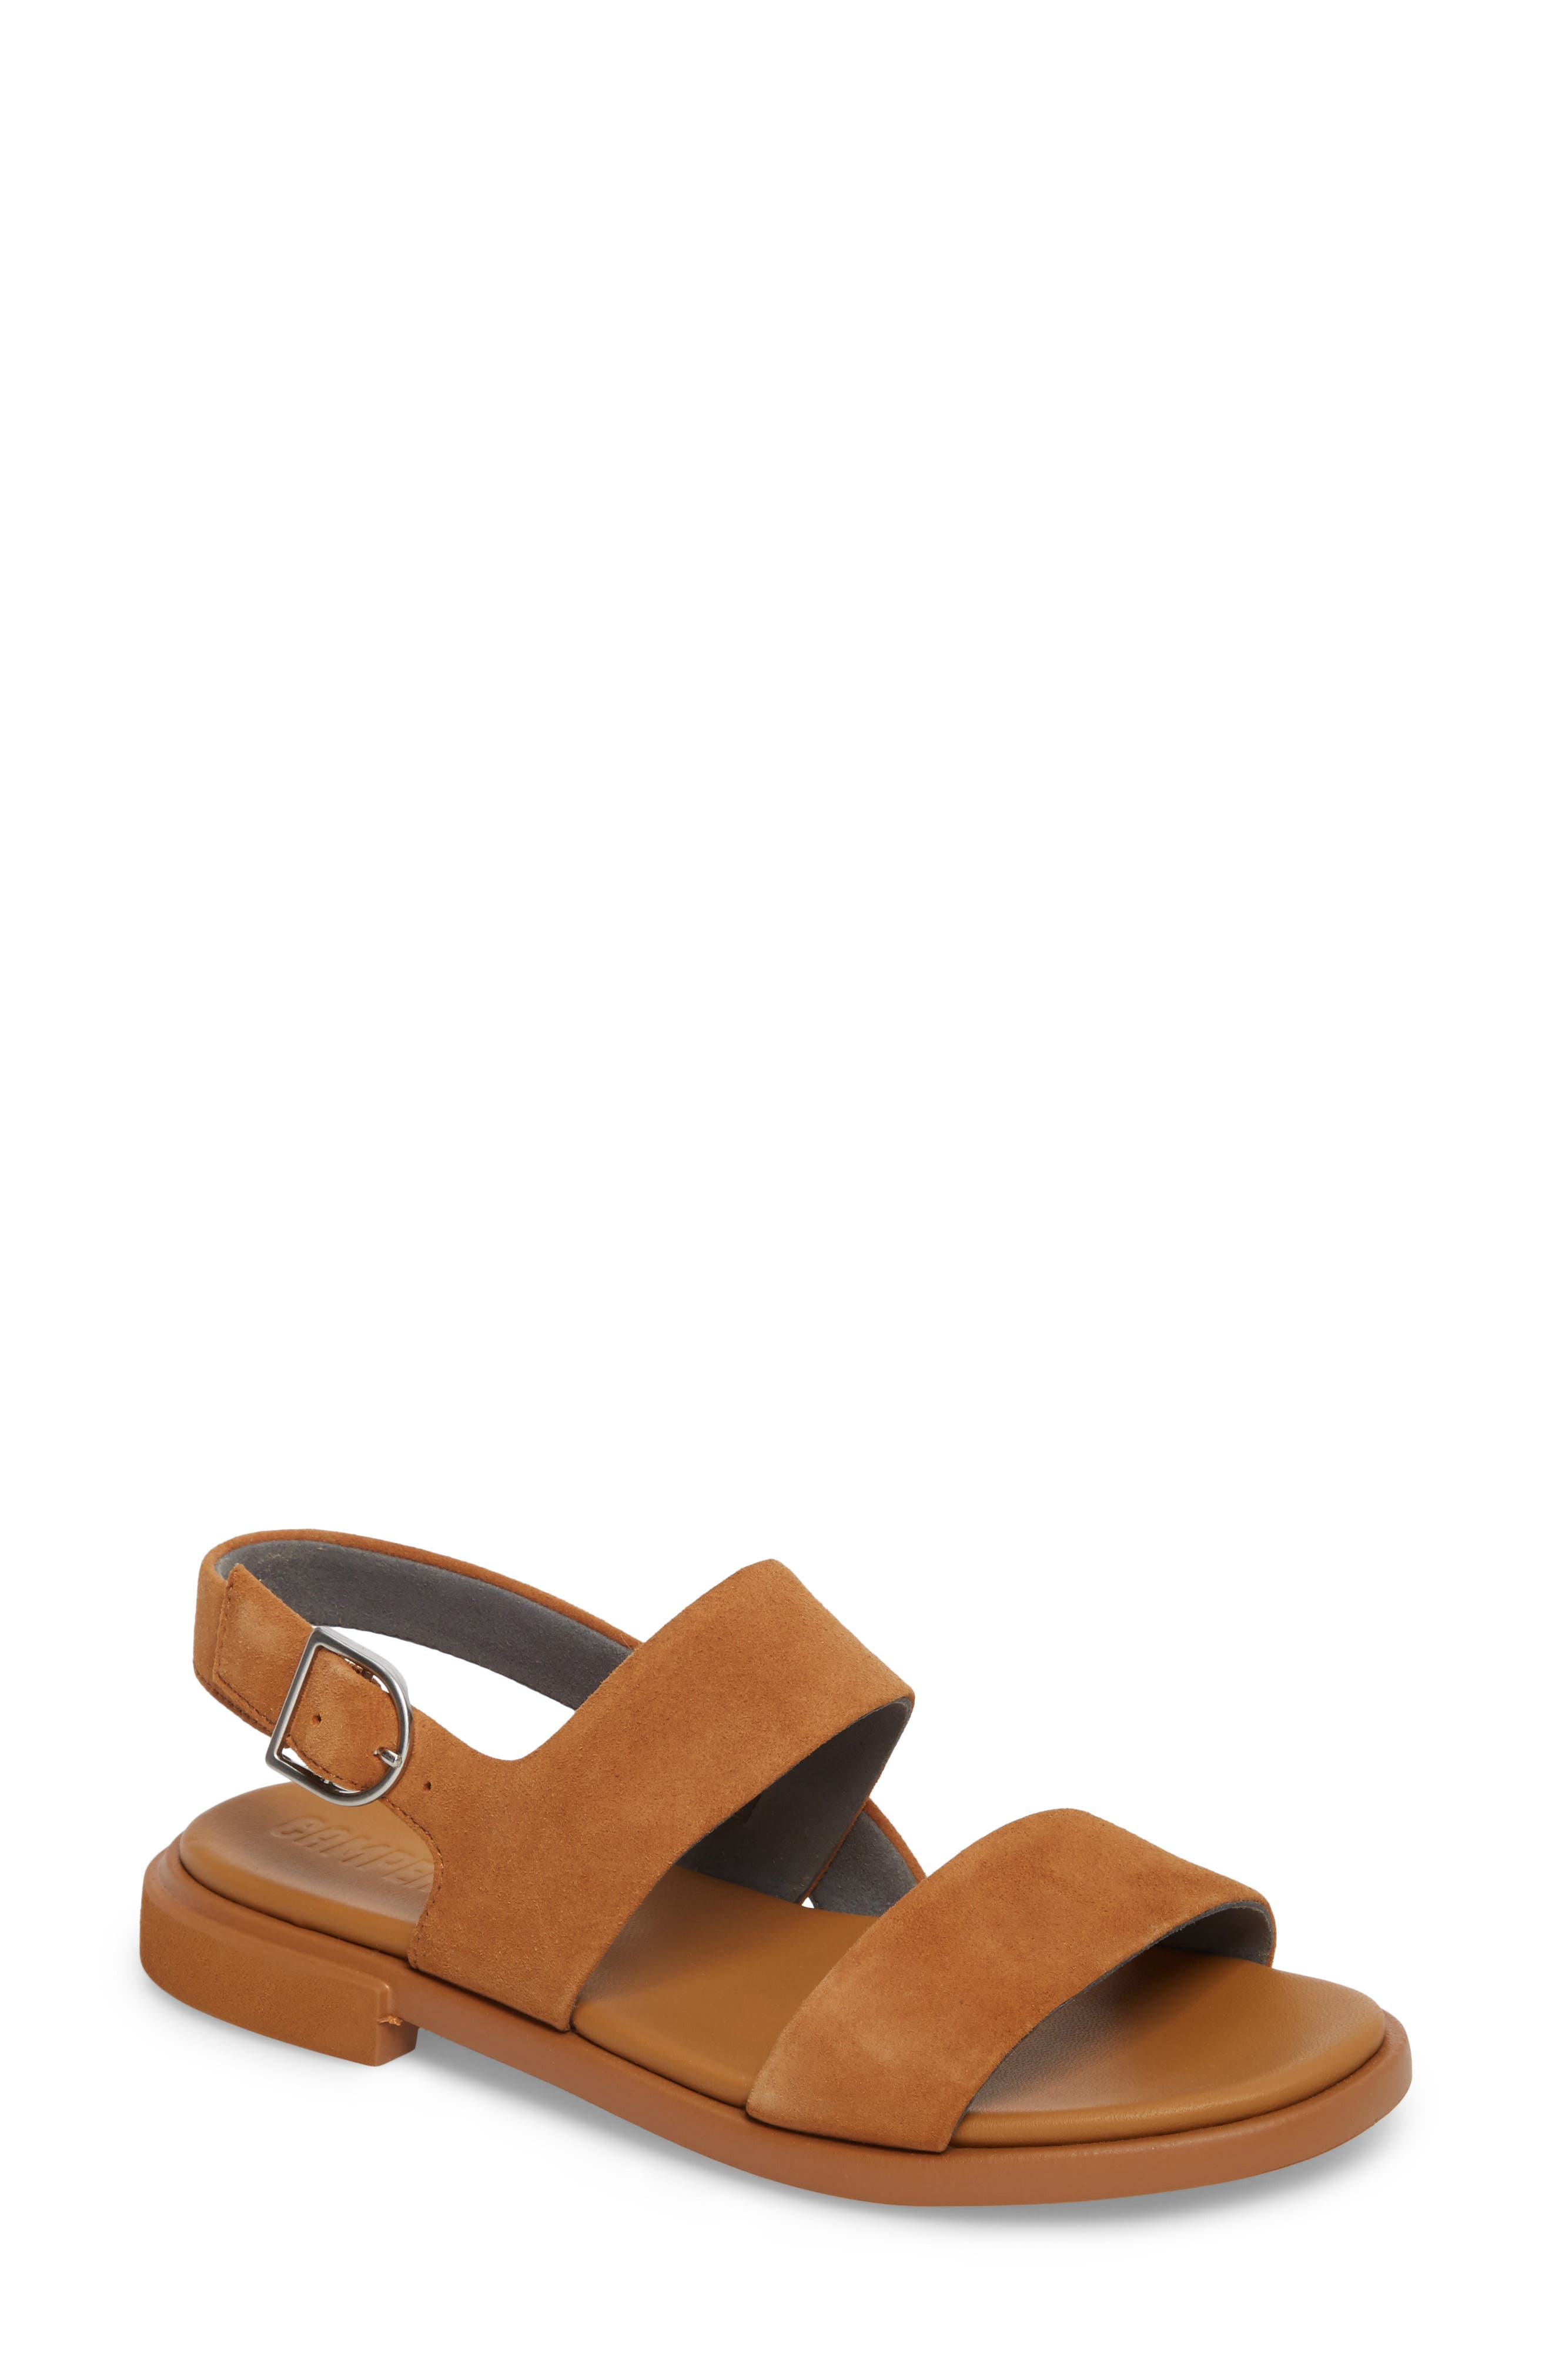 Edy Sandal,                         Main,                         color, Rust/ Copper Suede